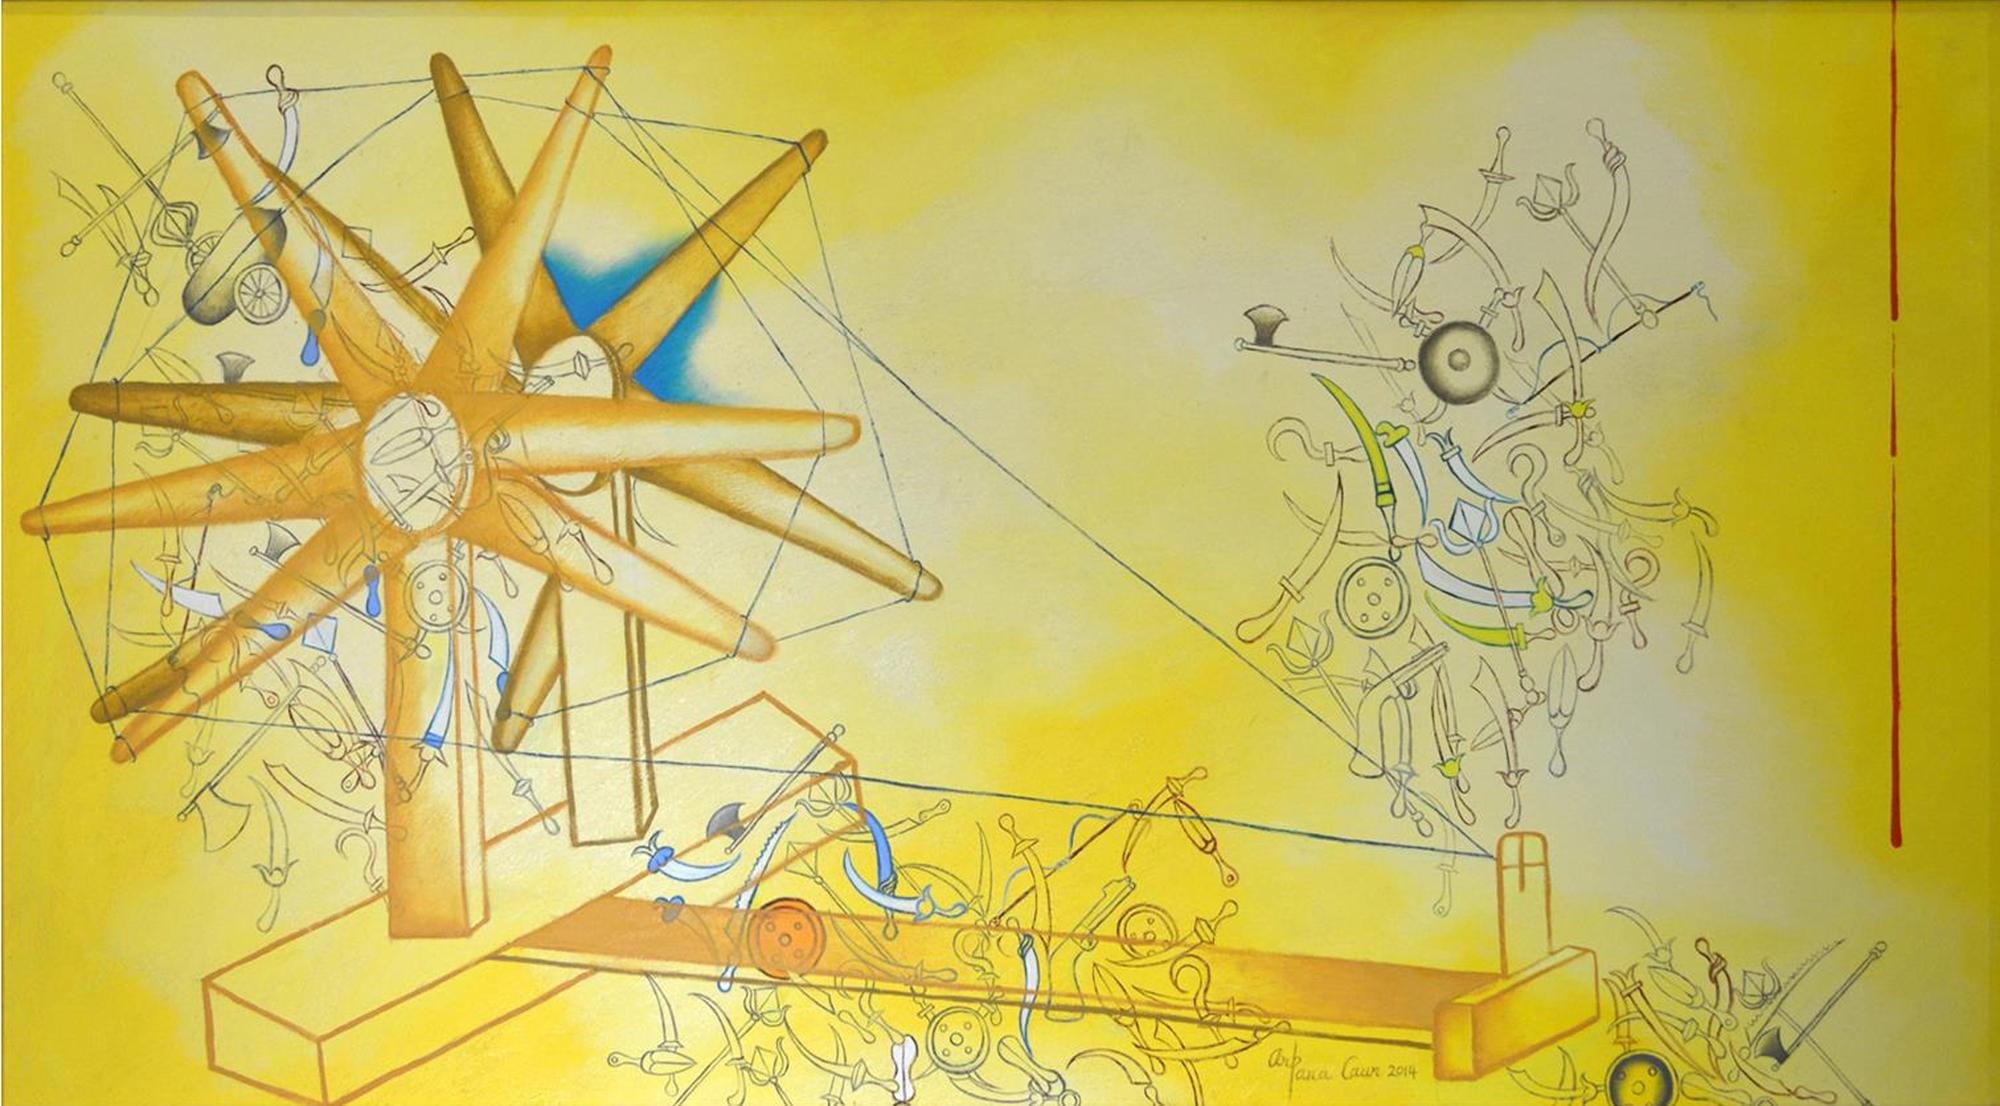 Fig. 6. Arpana Caur, <em>Charkha (Yellow)</em>, acrylic on canvas, 2014<br />Image courtesy Vijay Kumar Aggarwal, Swaraj Art Archive, Noida